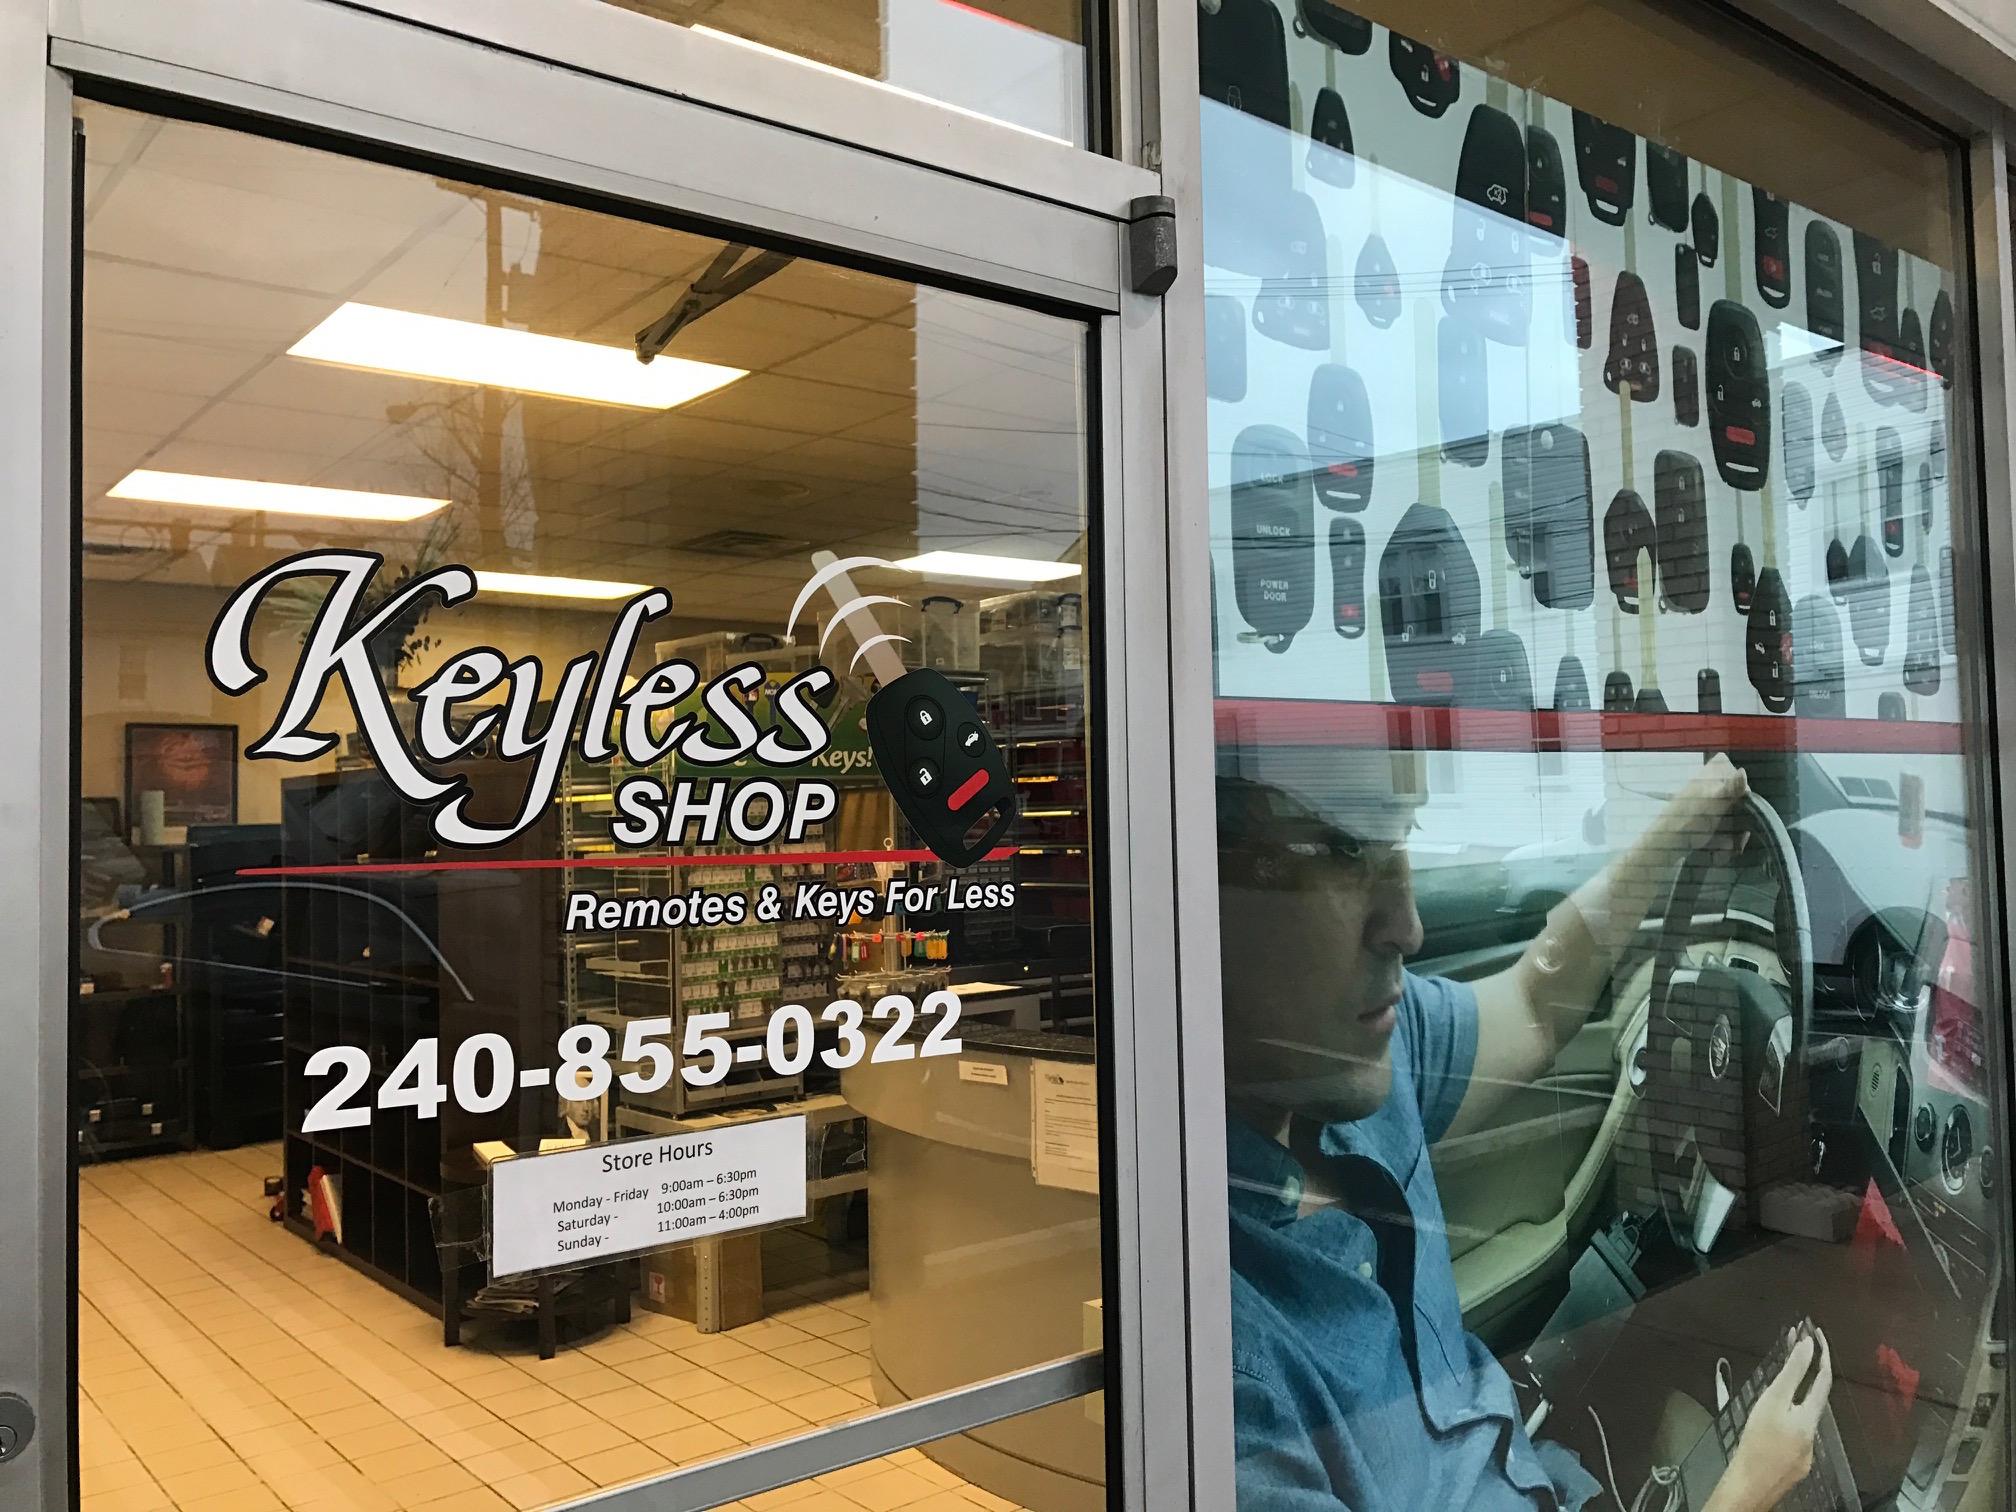 The Keyless Shop in Hagerstown, MD.    https://www.facebook.com/KeylessShopHagerstown